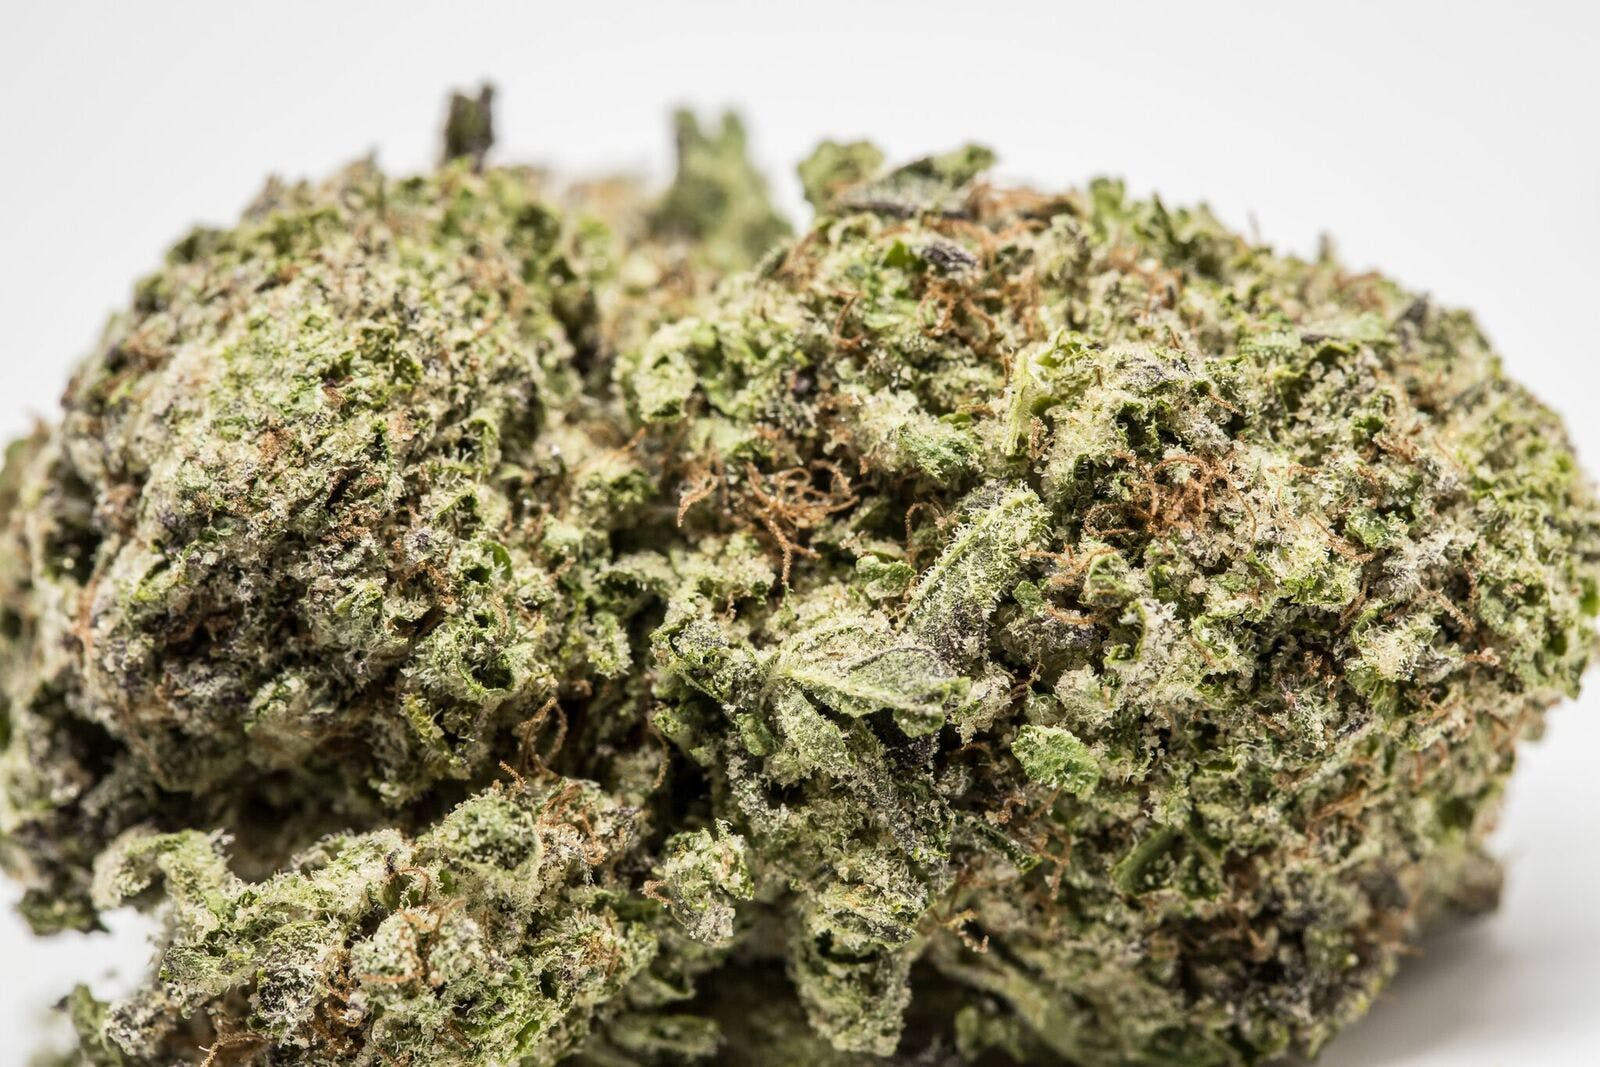 Candy Cookies Weed; Candy Cookies Cannabis Strain; Candy Cookies Hybrid Marijuana Strain